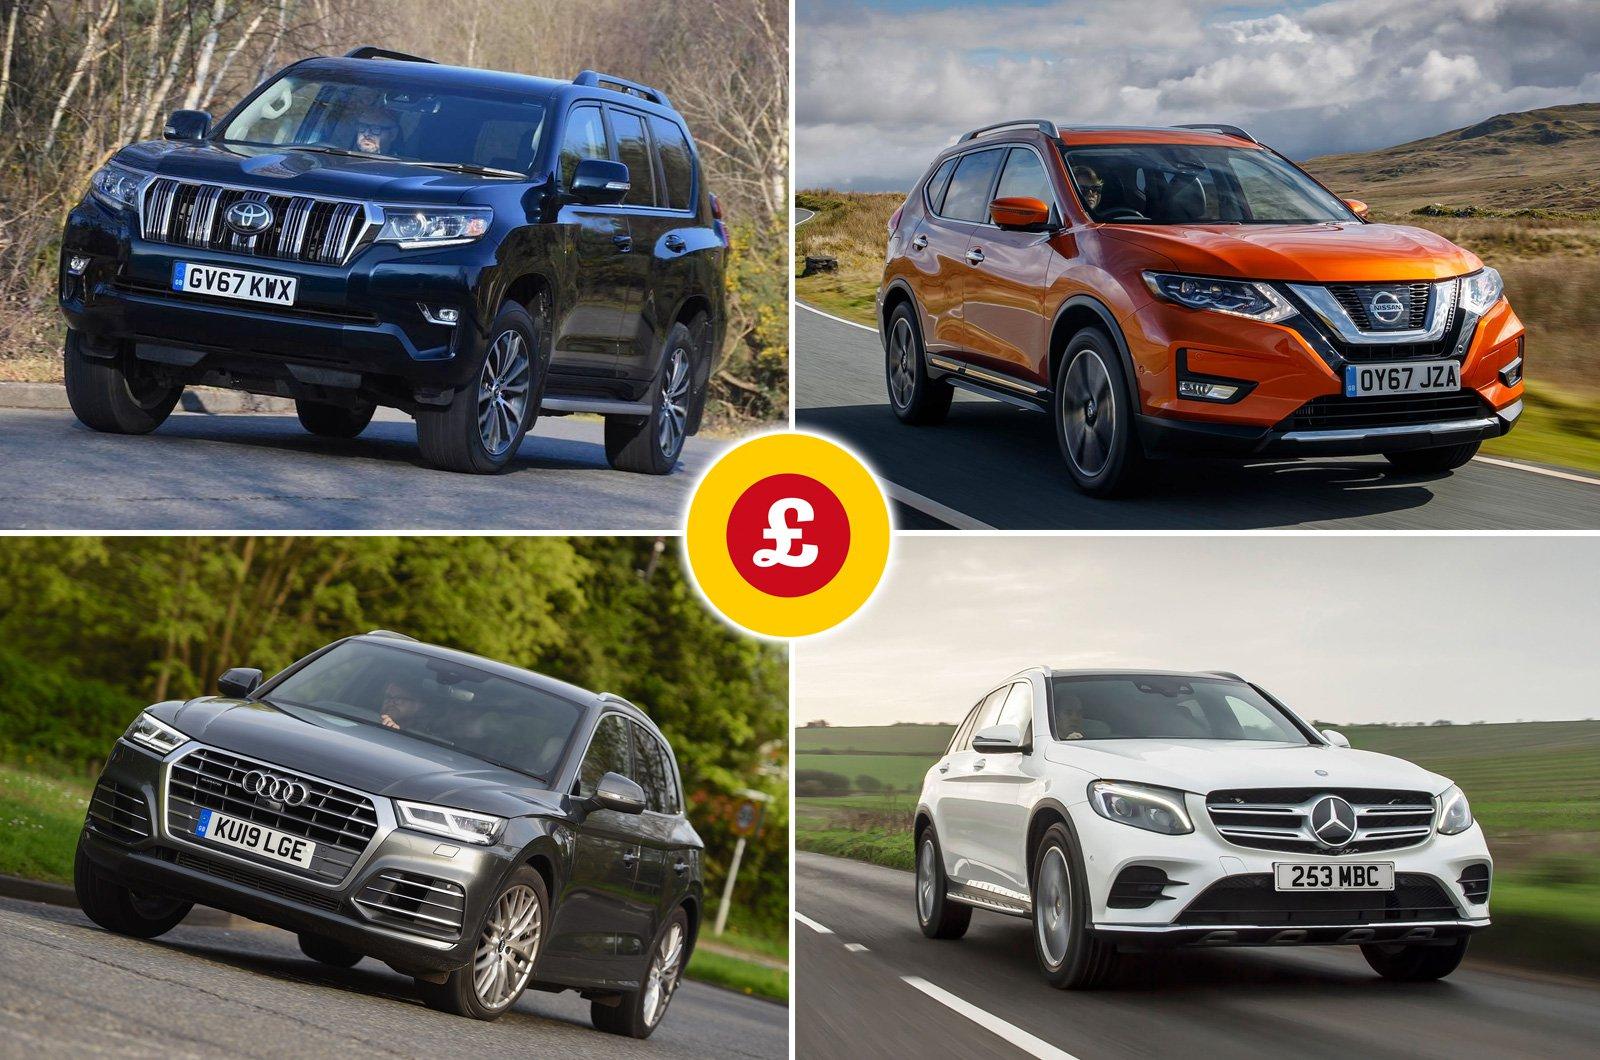 Toyota Land Cruiser, Nissan X-Trail, Audi Q5, Mercedes GLC